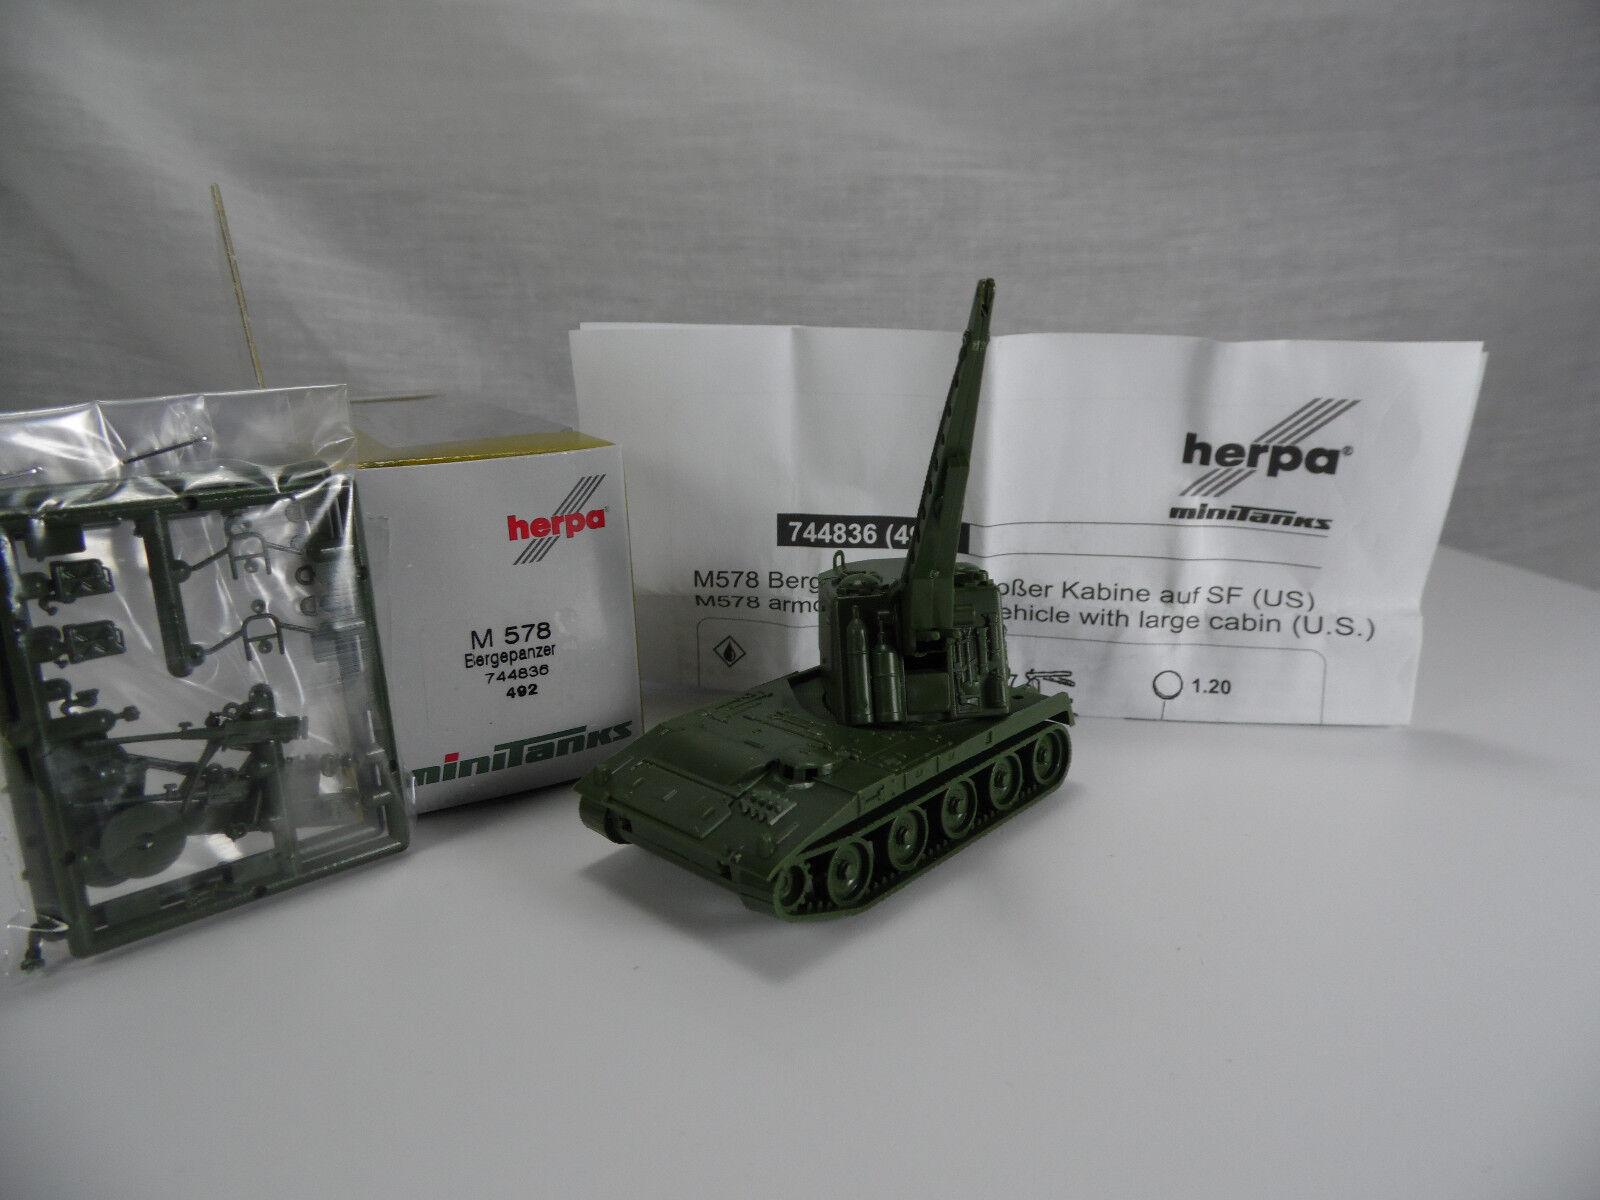 Ht207, Ht207, Ht207, roco   herpa 744836 m578 erholung tank bergepanzer   minitanks   f  r 70853c